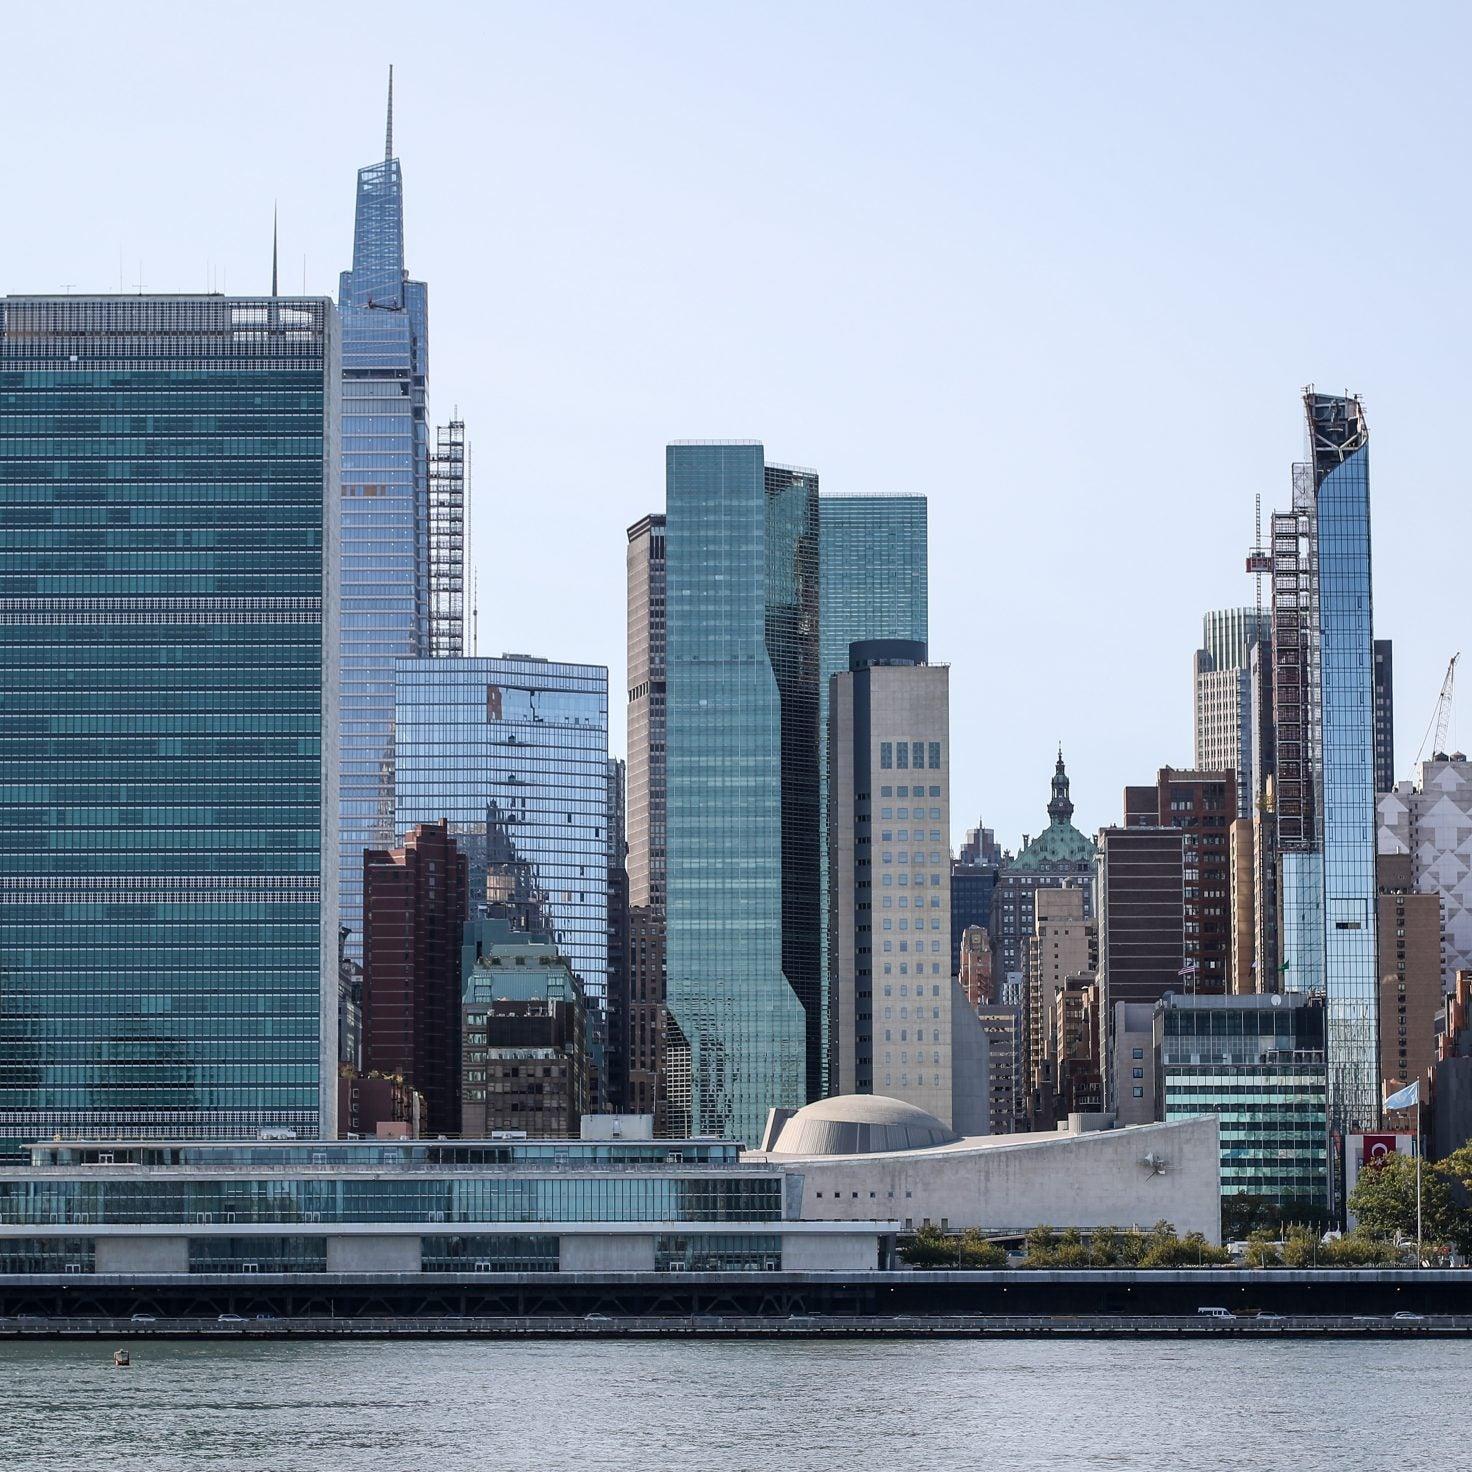 New Yorkers Respond To DOJ's Anarchist Jurisdiction Designation